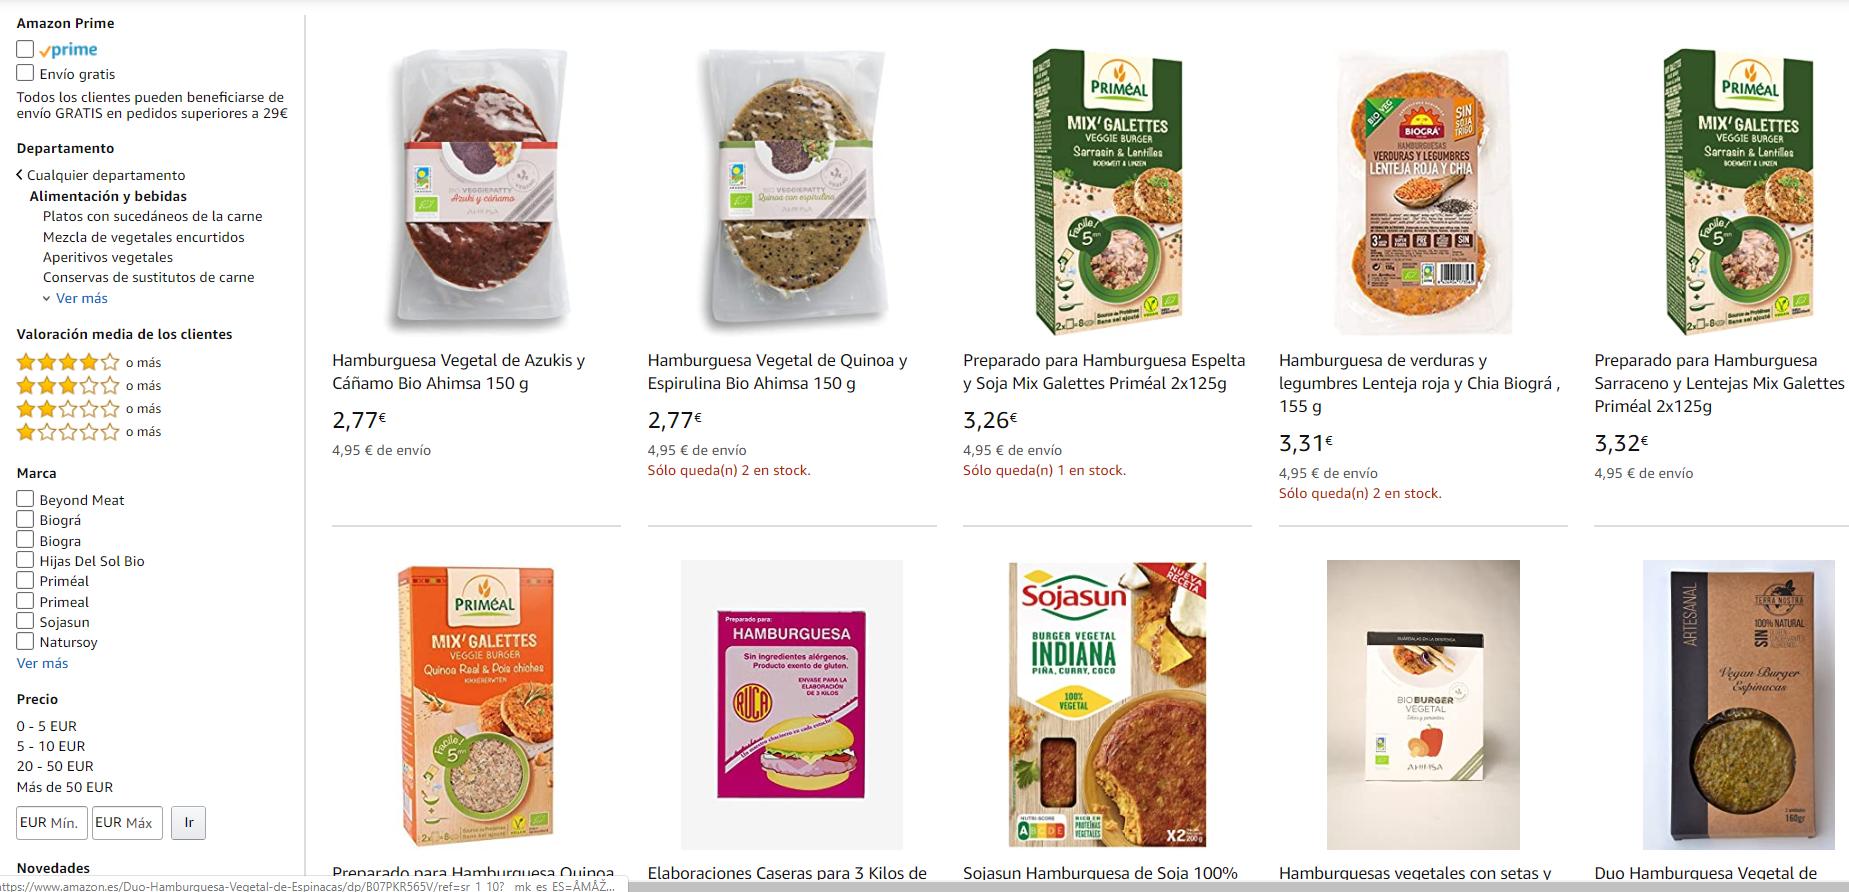 comprar hamburguesas vegetales Amazon